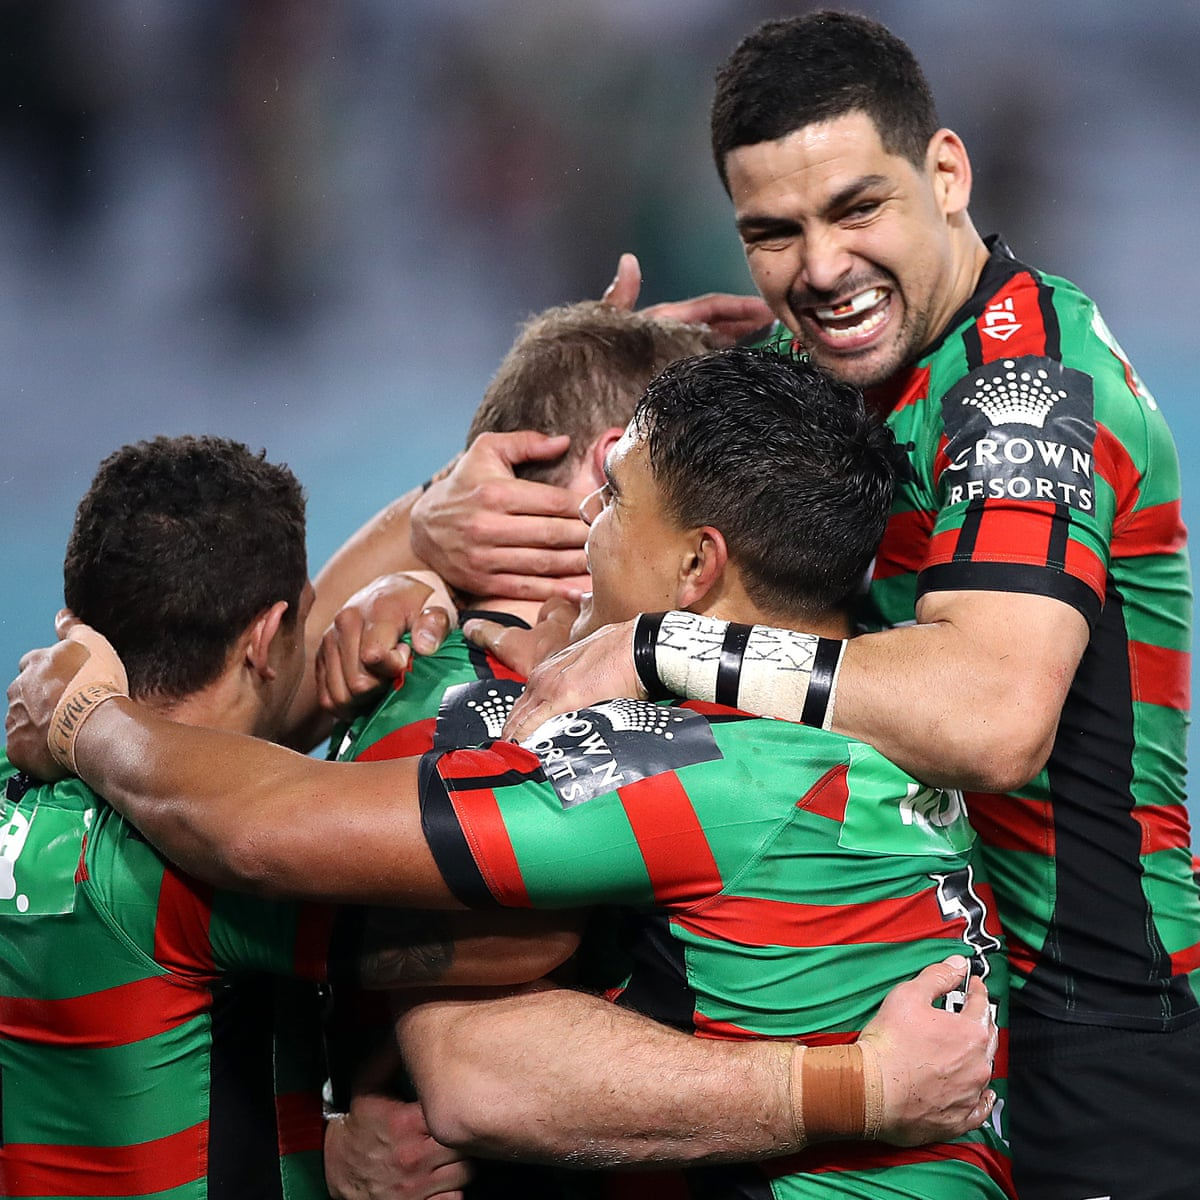 Nrl South Sydney Rabbitohs V Brisbane Broncos As It Happened Sport The Guardian